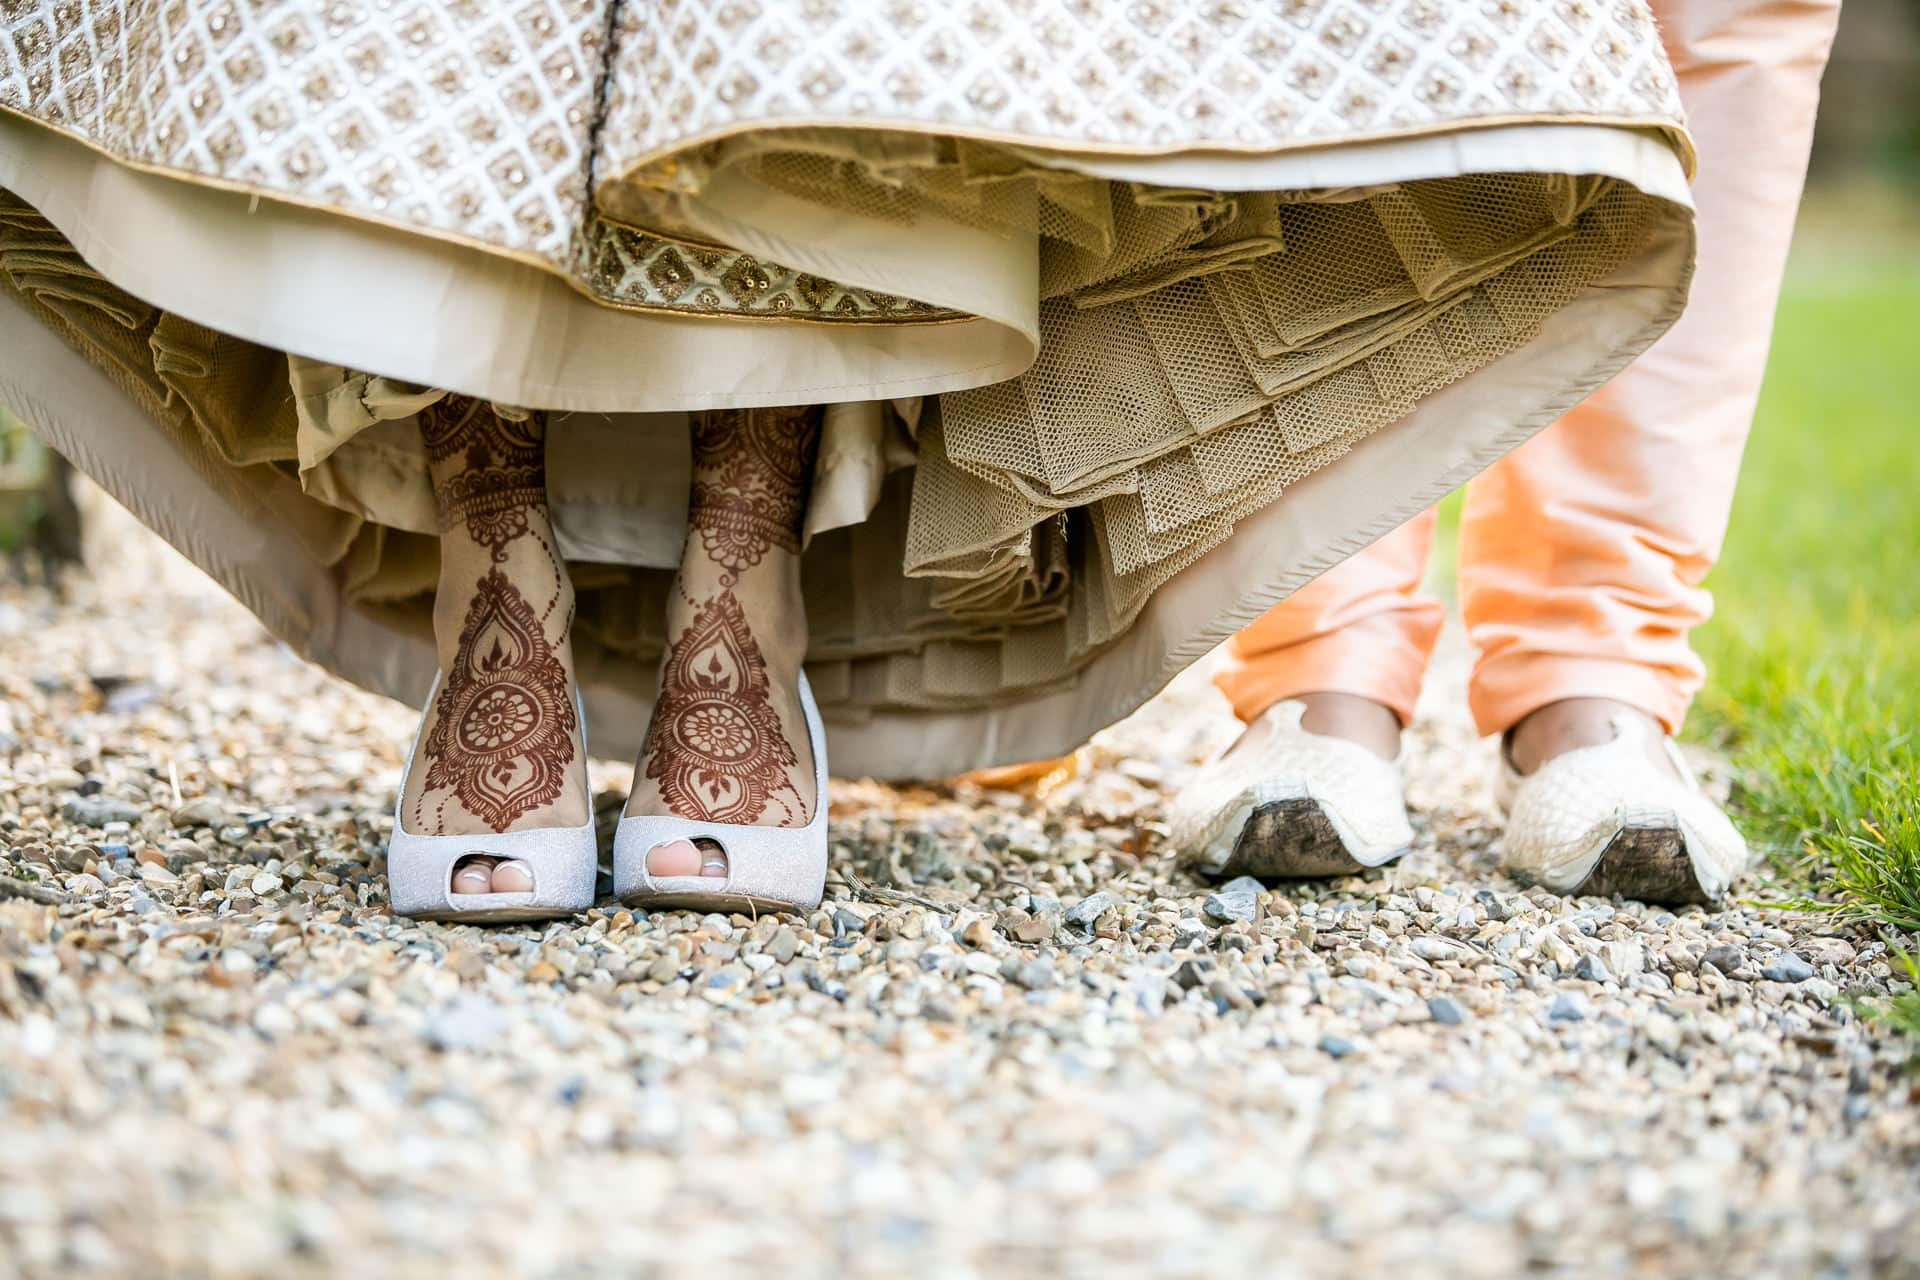 Hindu wedding bride and groom shoes